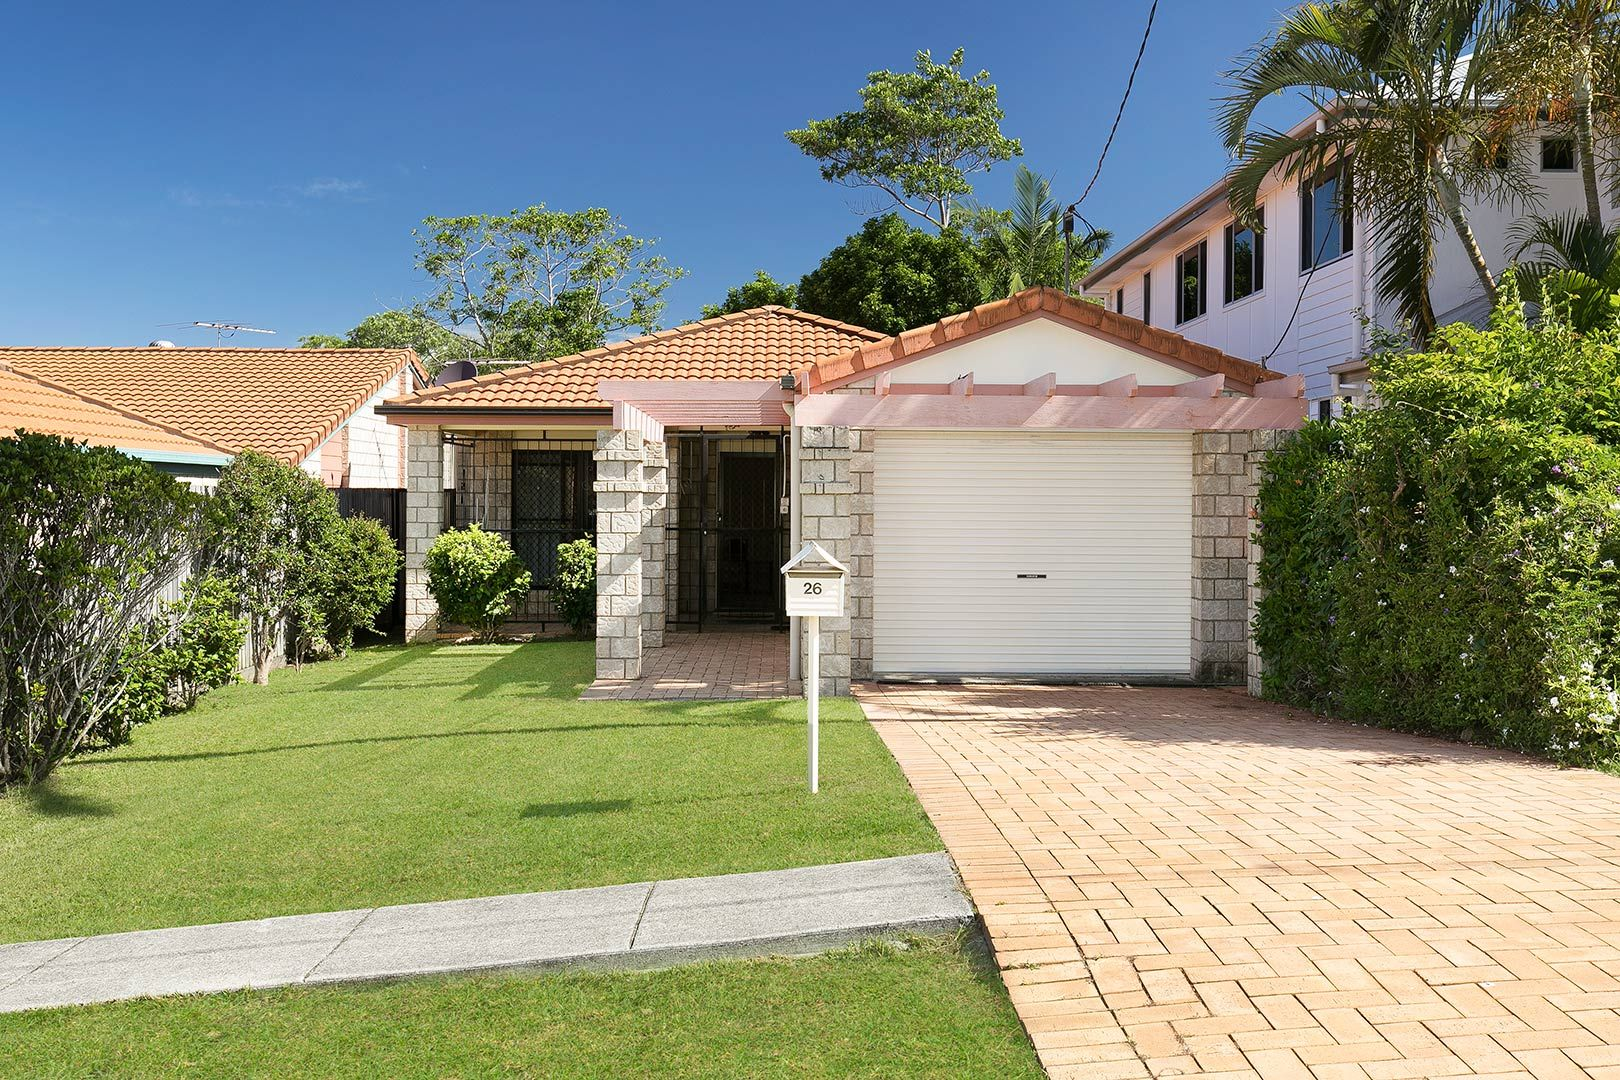 26 White Street, Everton Park QLD 4053, Image 0